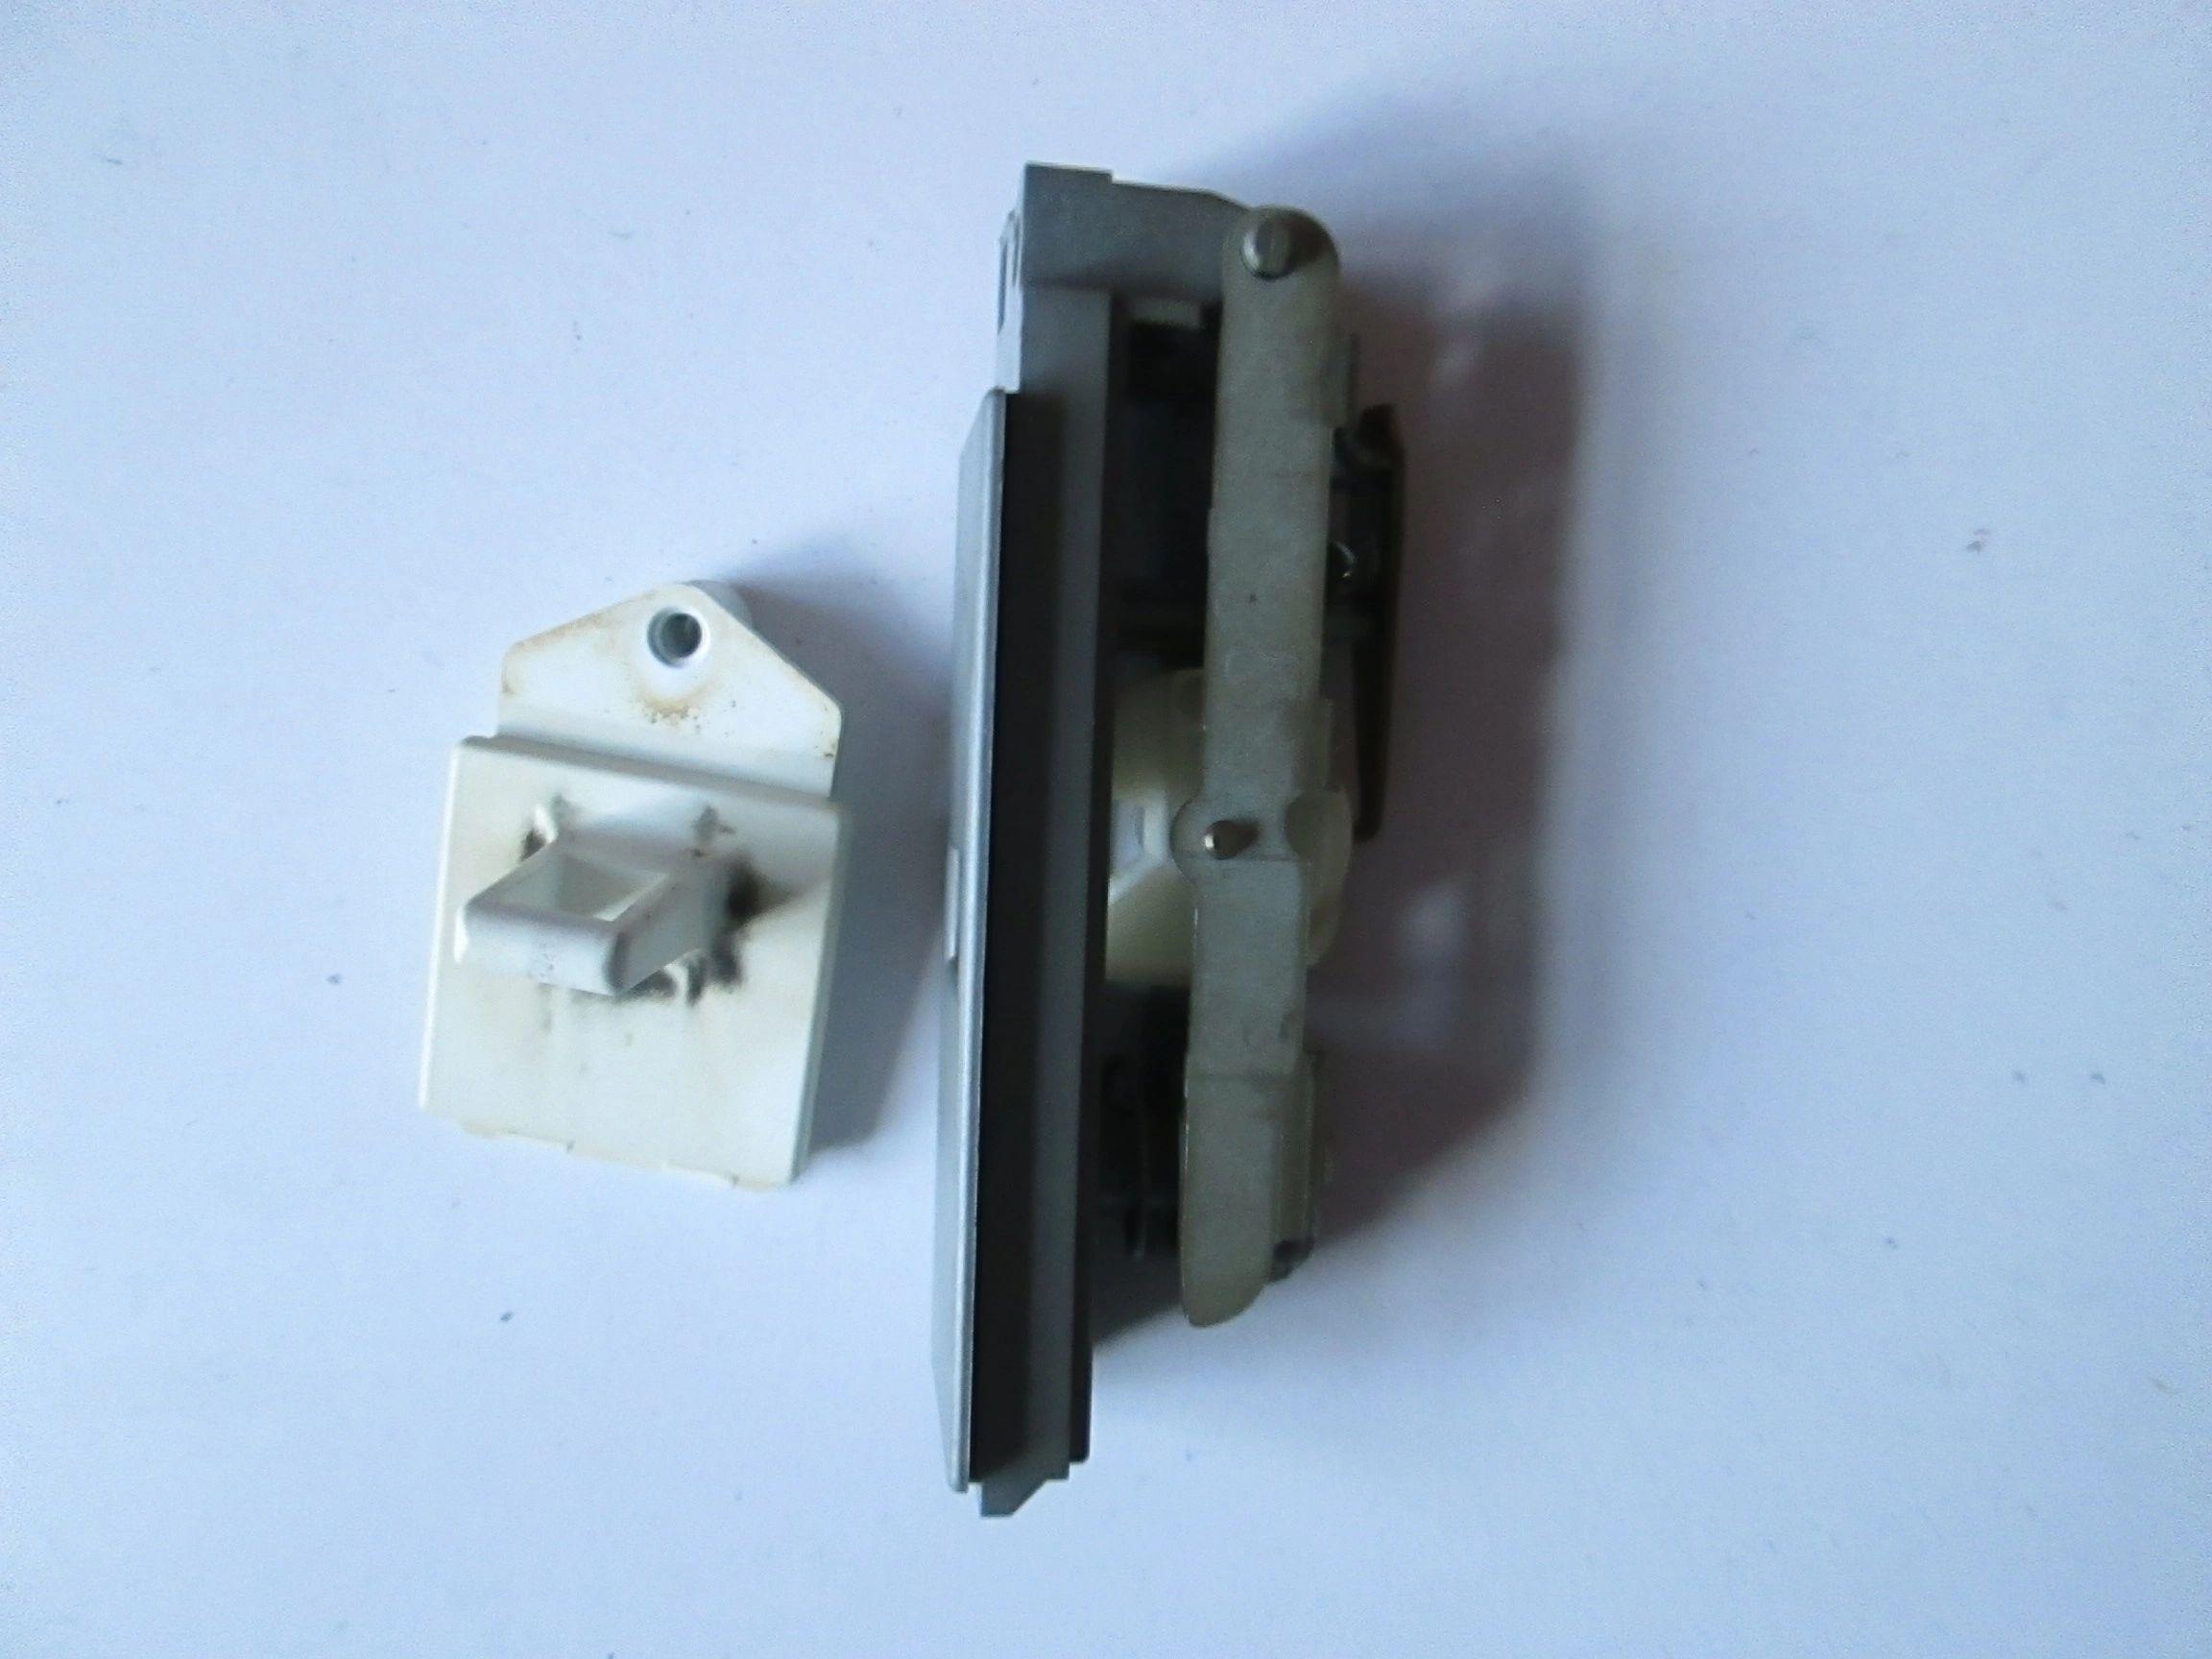 ARISTON Genuine Tumble Dryer Door Lock Catch /& Latch Kit C00257618 Spare